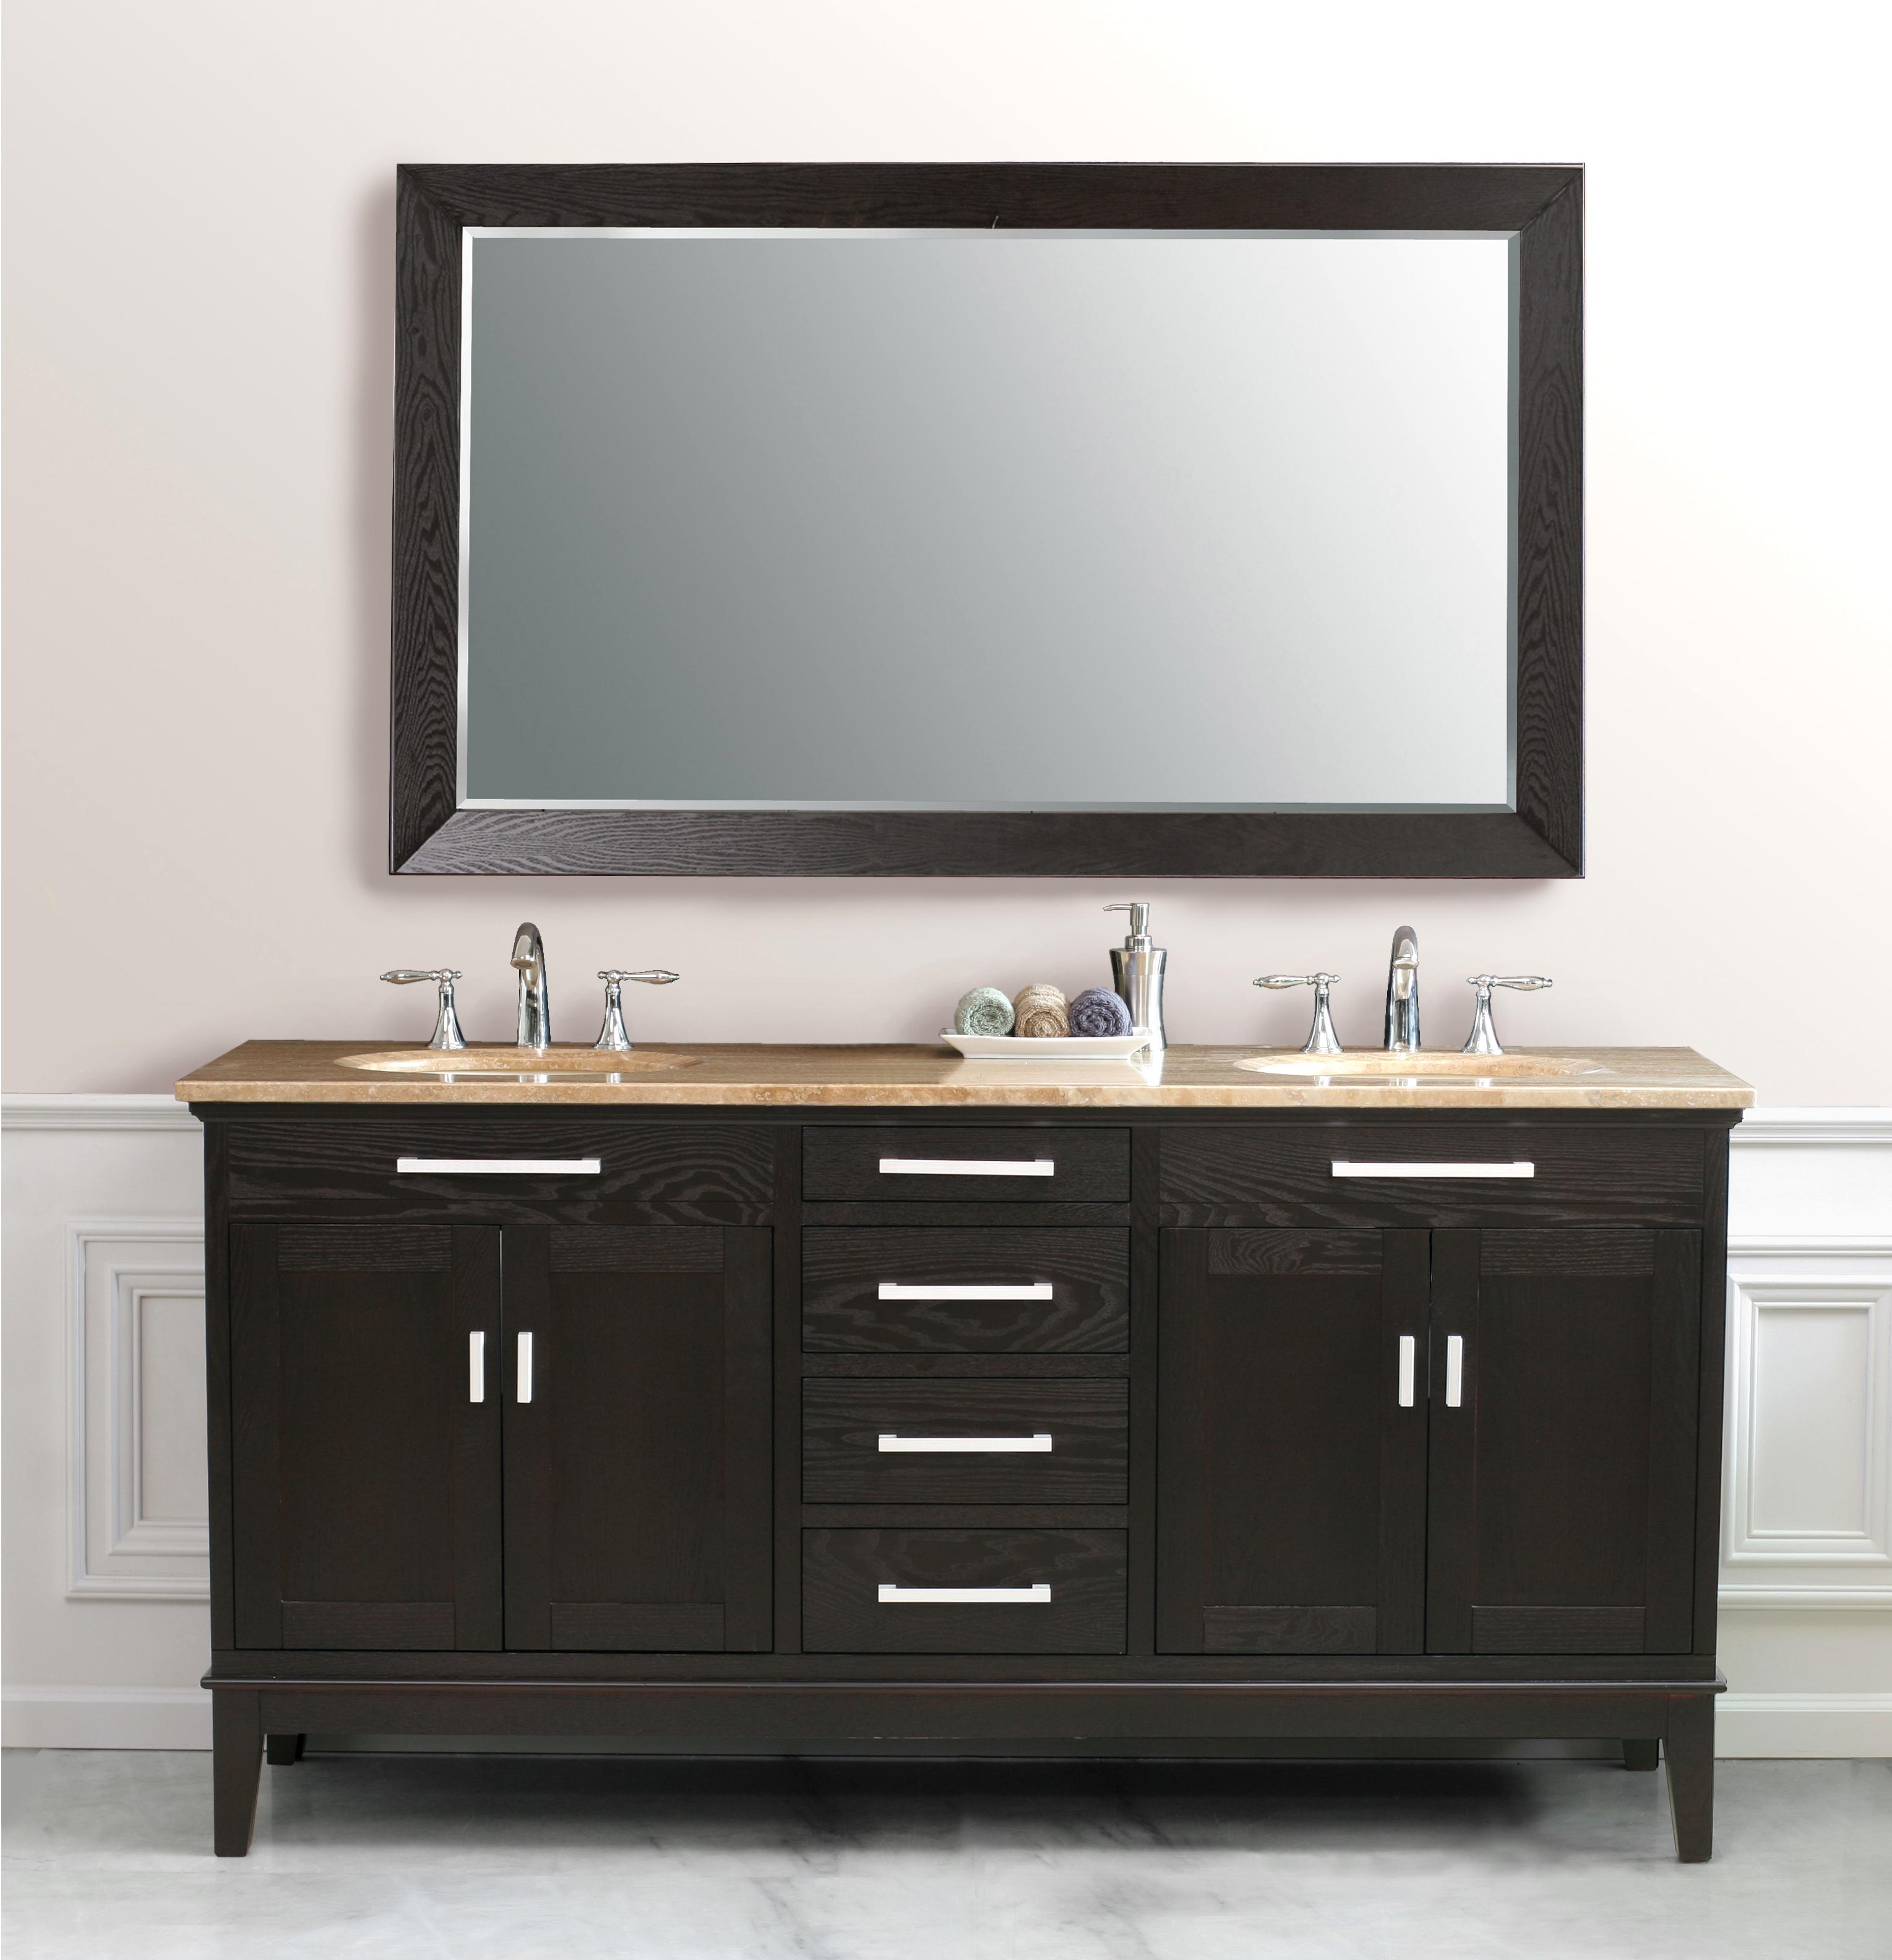 72-inch idaho vanity |dark espresso vanity | espresso double vanity